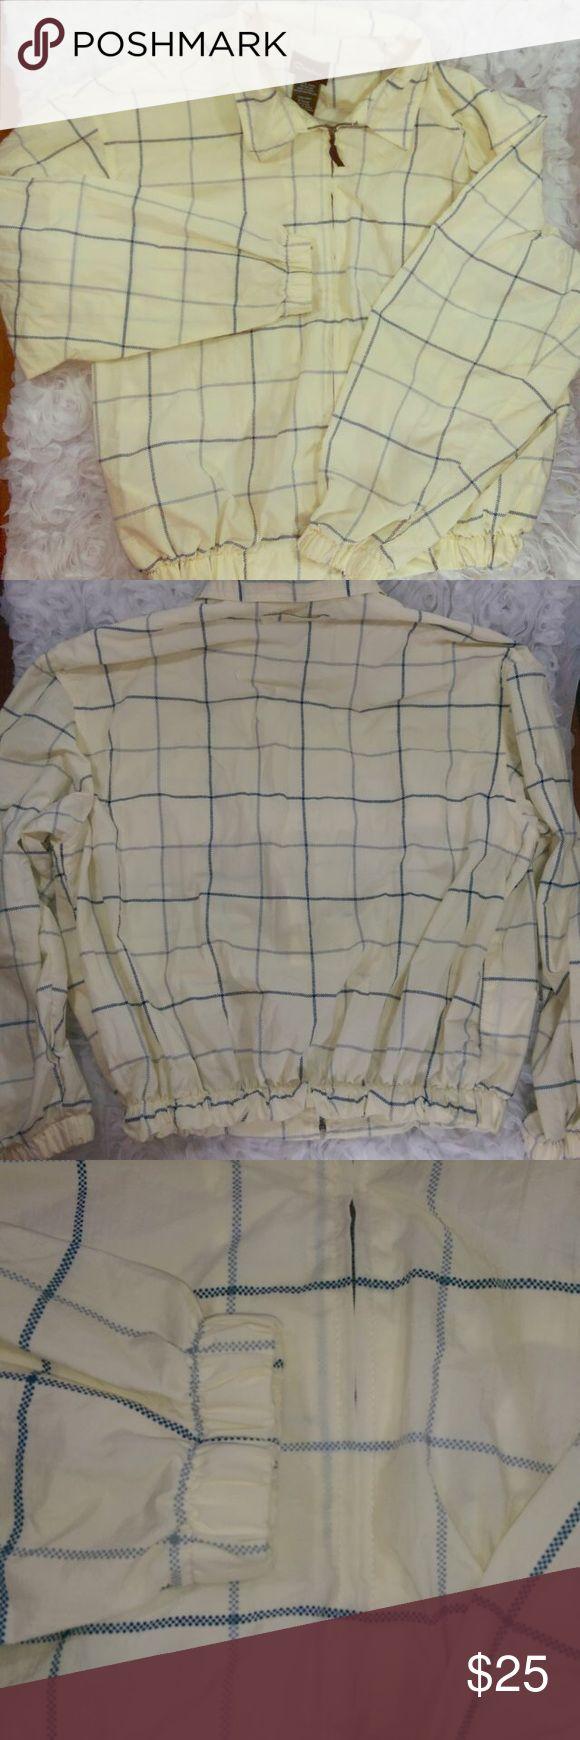 "Men's Golf Jacket Men's Golf Jacket Size Large CATALINA Cream Blue Plaid Check 100% Nylon Windbreaker Full Zipper ""Armpit to Armpit - 28"""" Sleeve - 25"""" Shoulder to Hem - 26"""""" catalina Jackets & Coats"